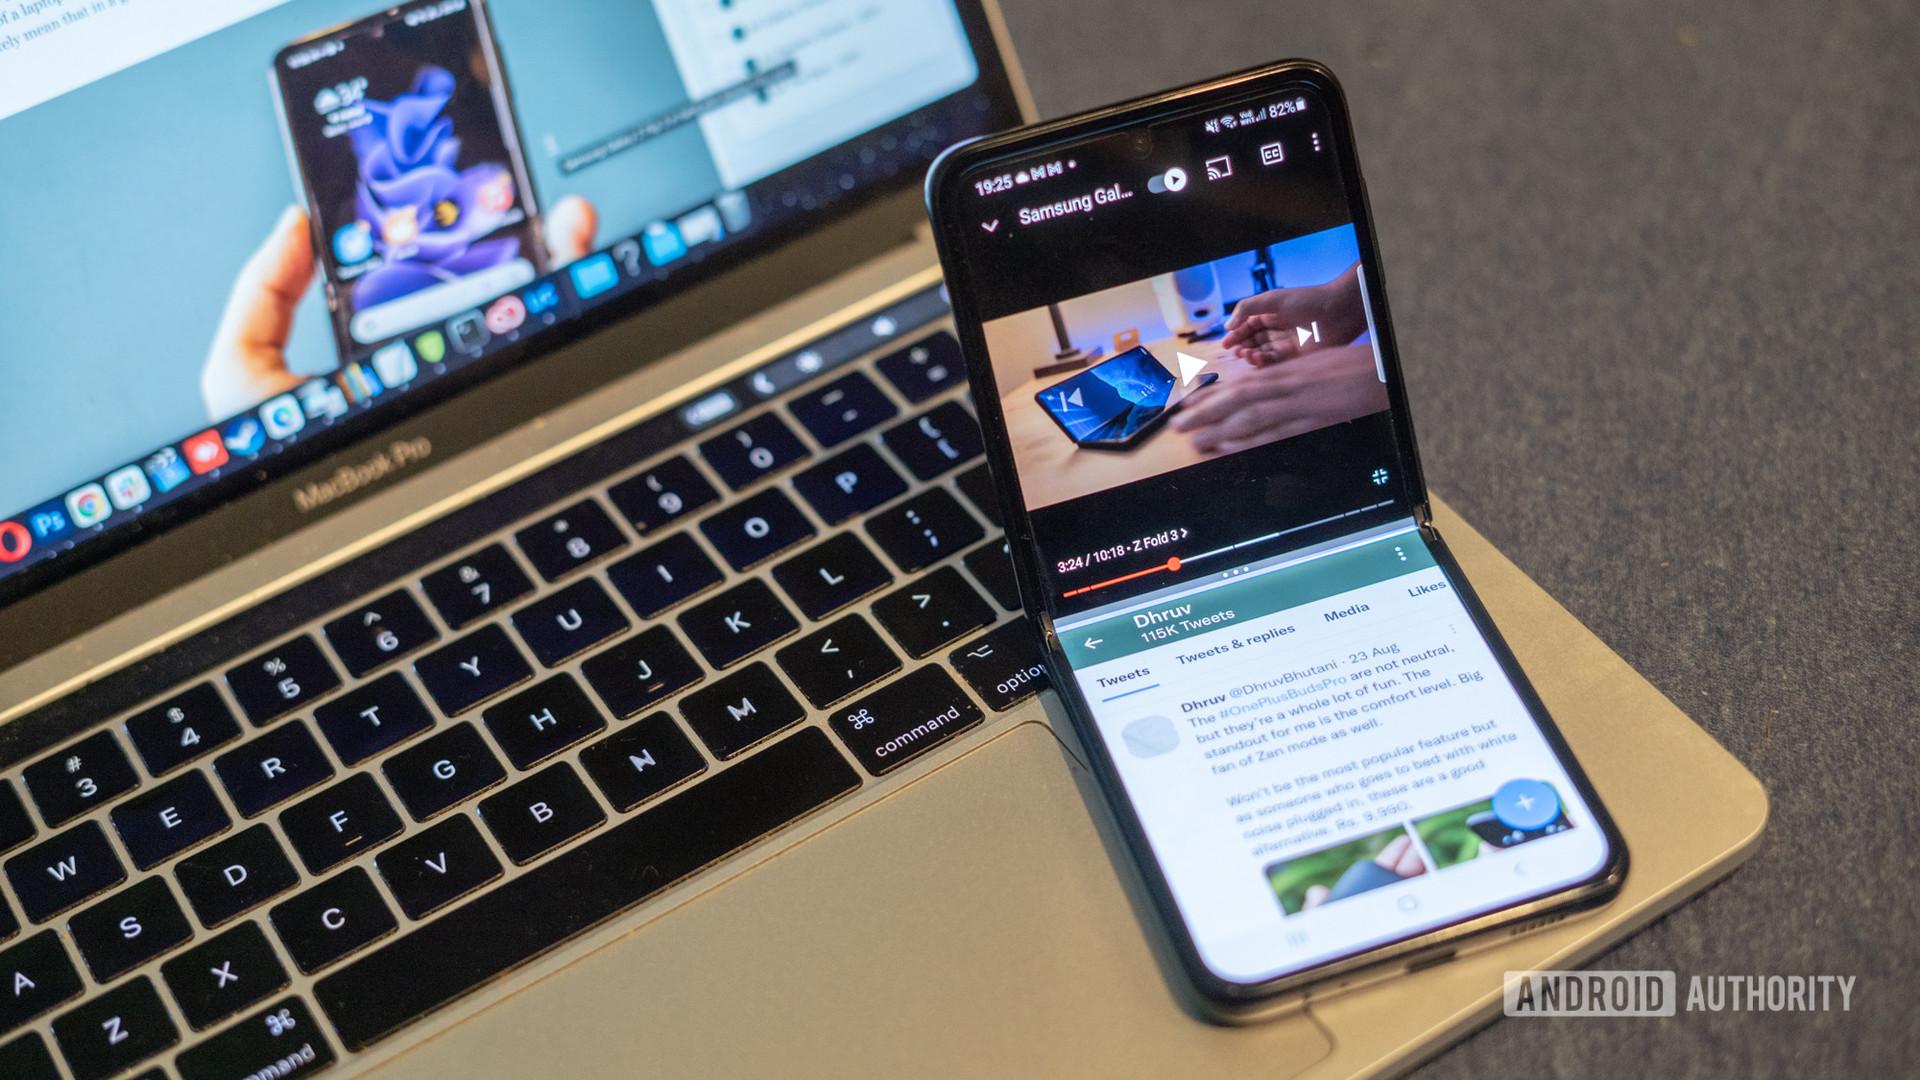 Samsung Galaxy Z Flip 3 tabletop mode